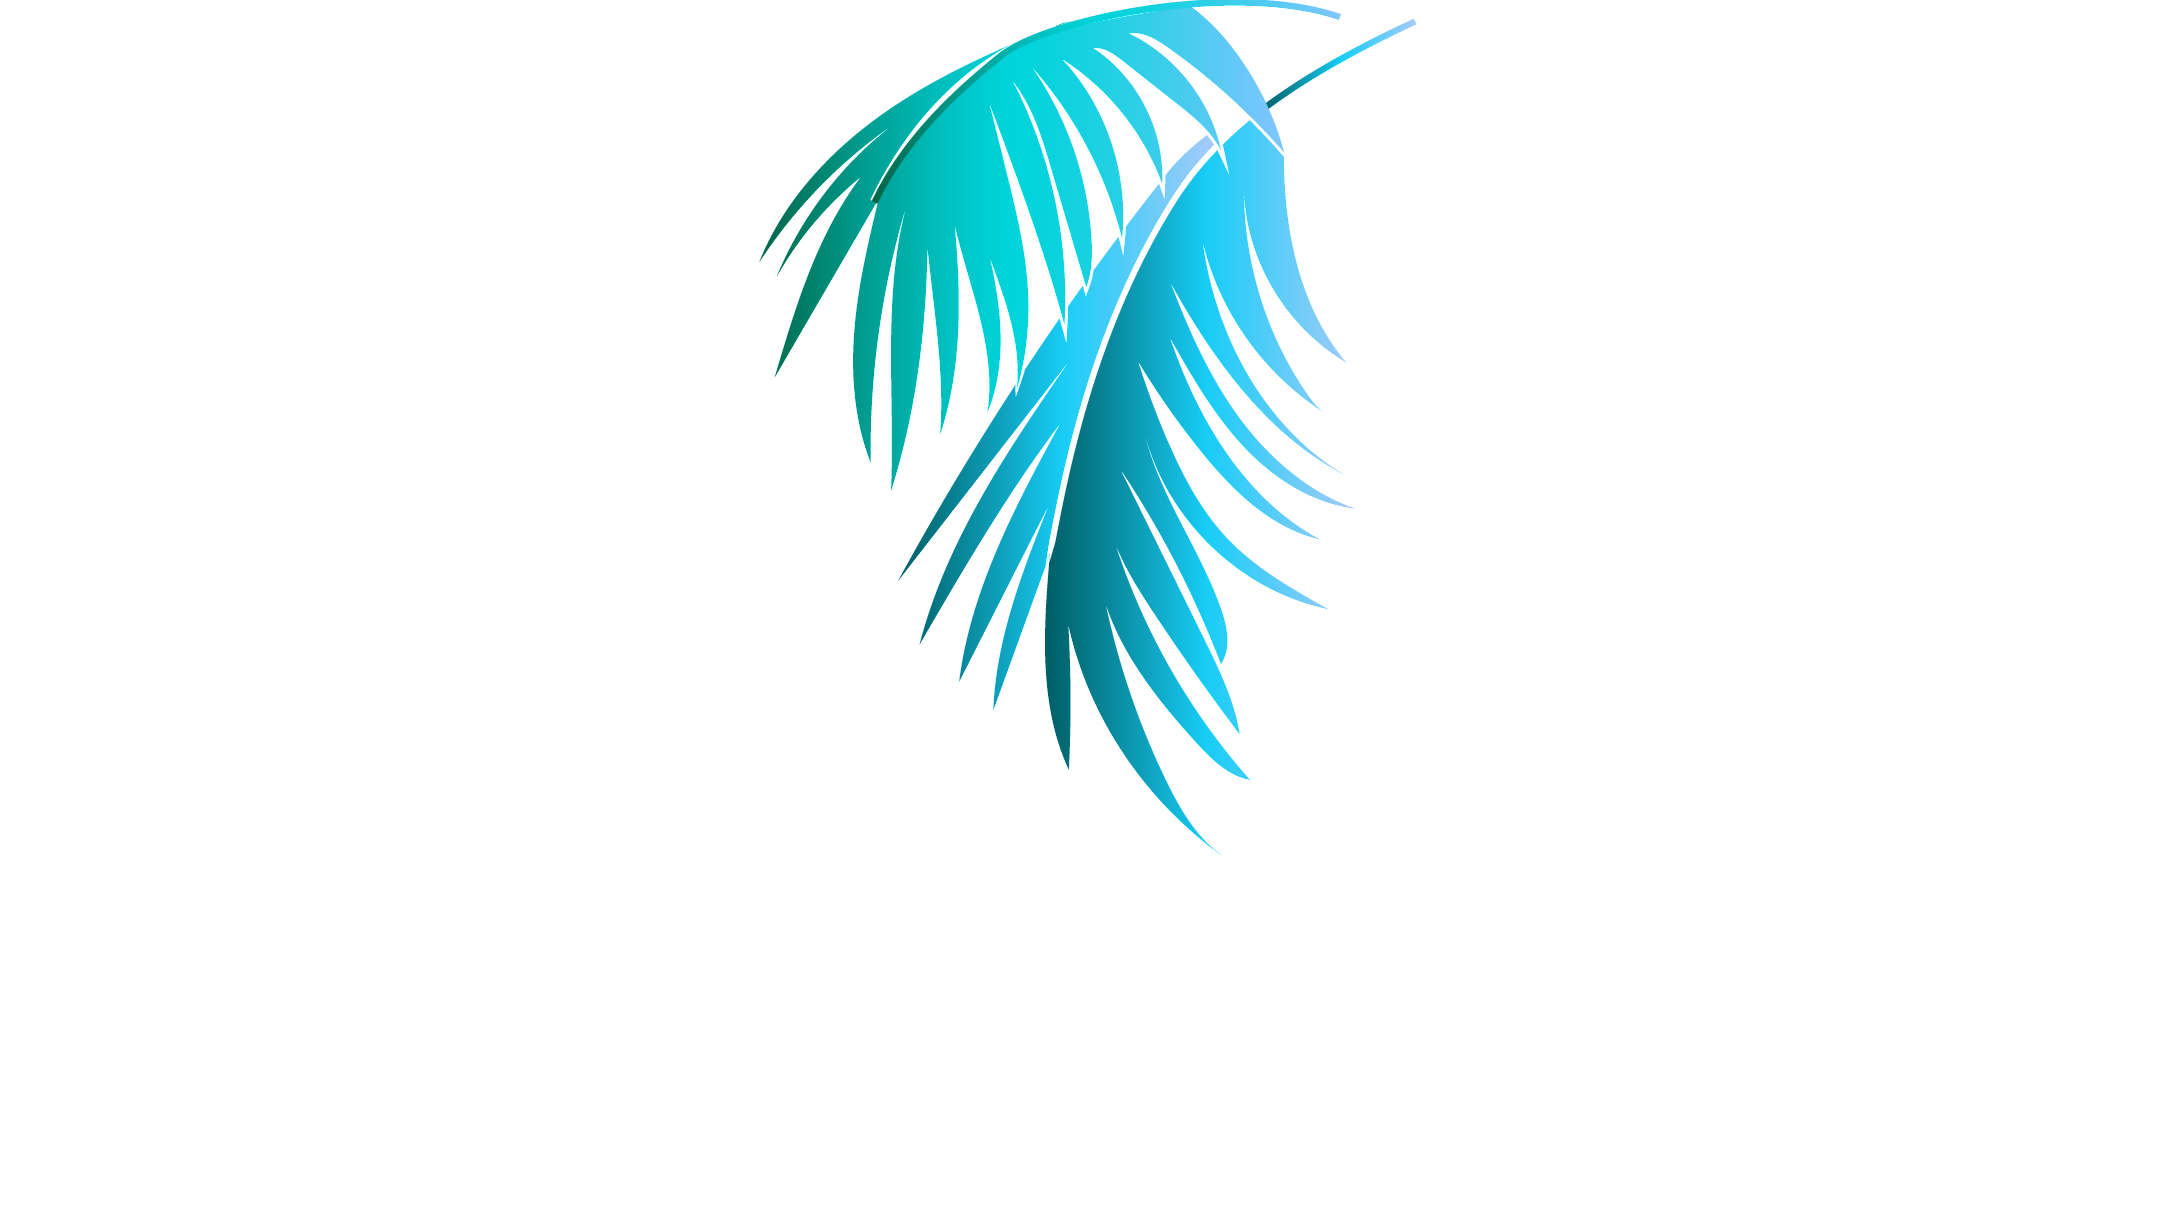 Explore Sailing Club Leisure Group Sailing Club Villas Phu Quoc Logo